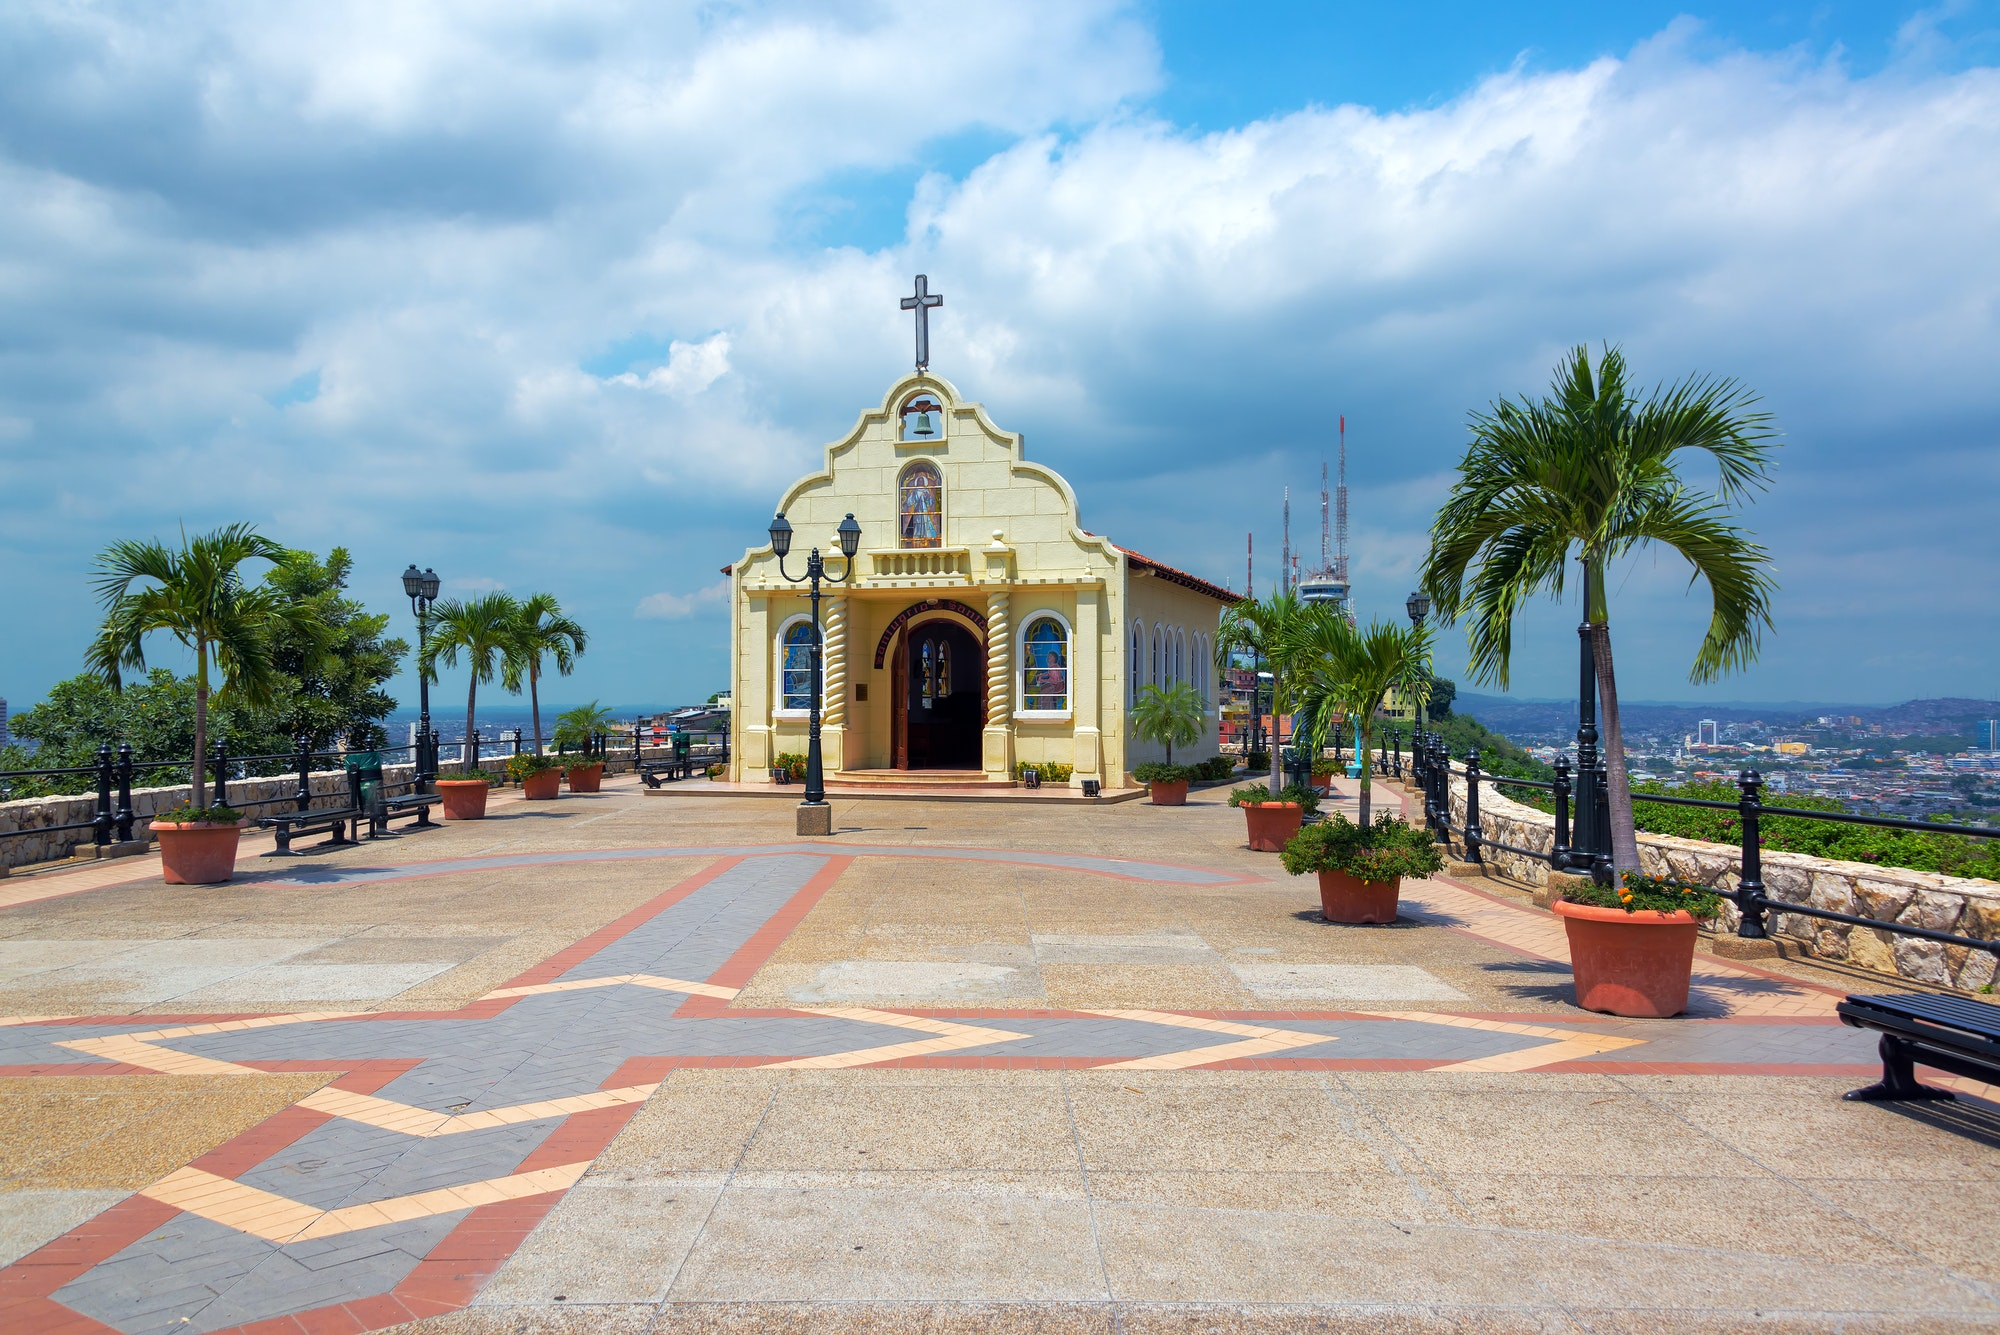 Church in Guayaquil, Ecuador